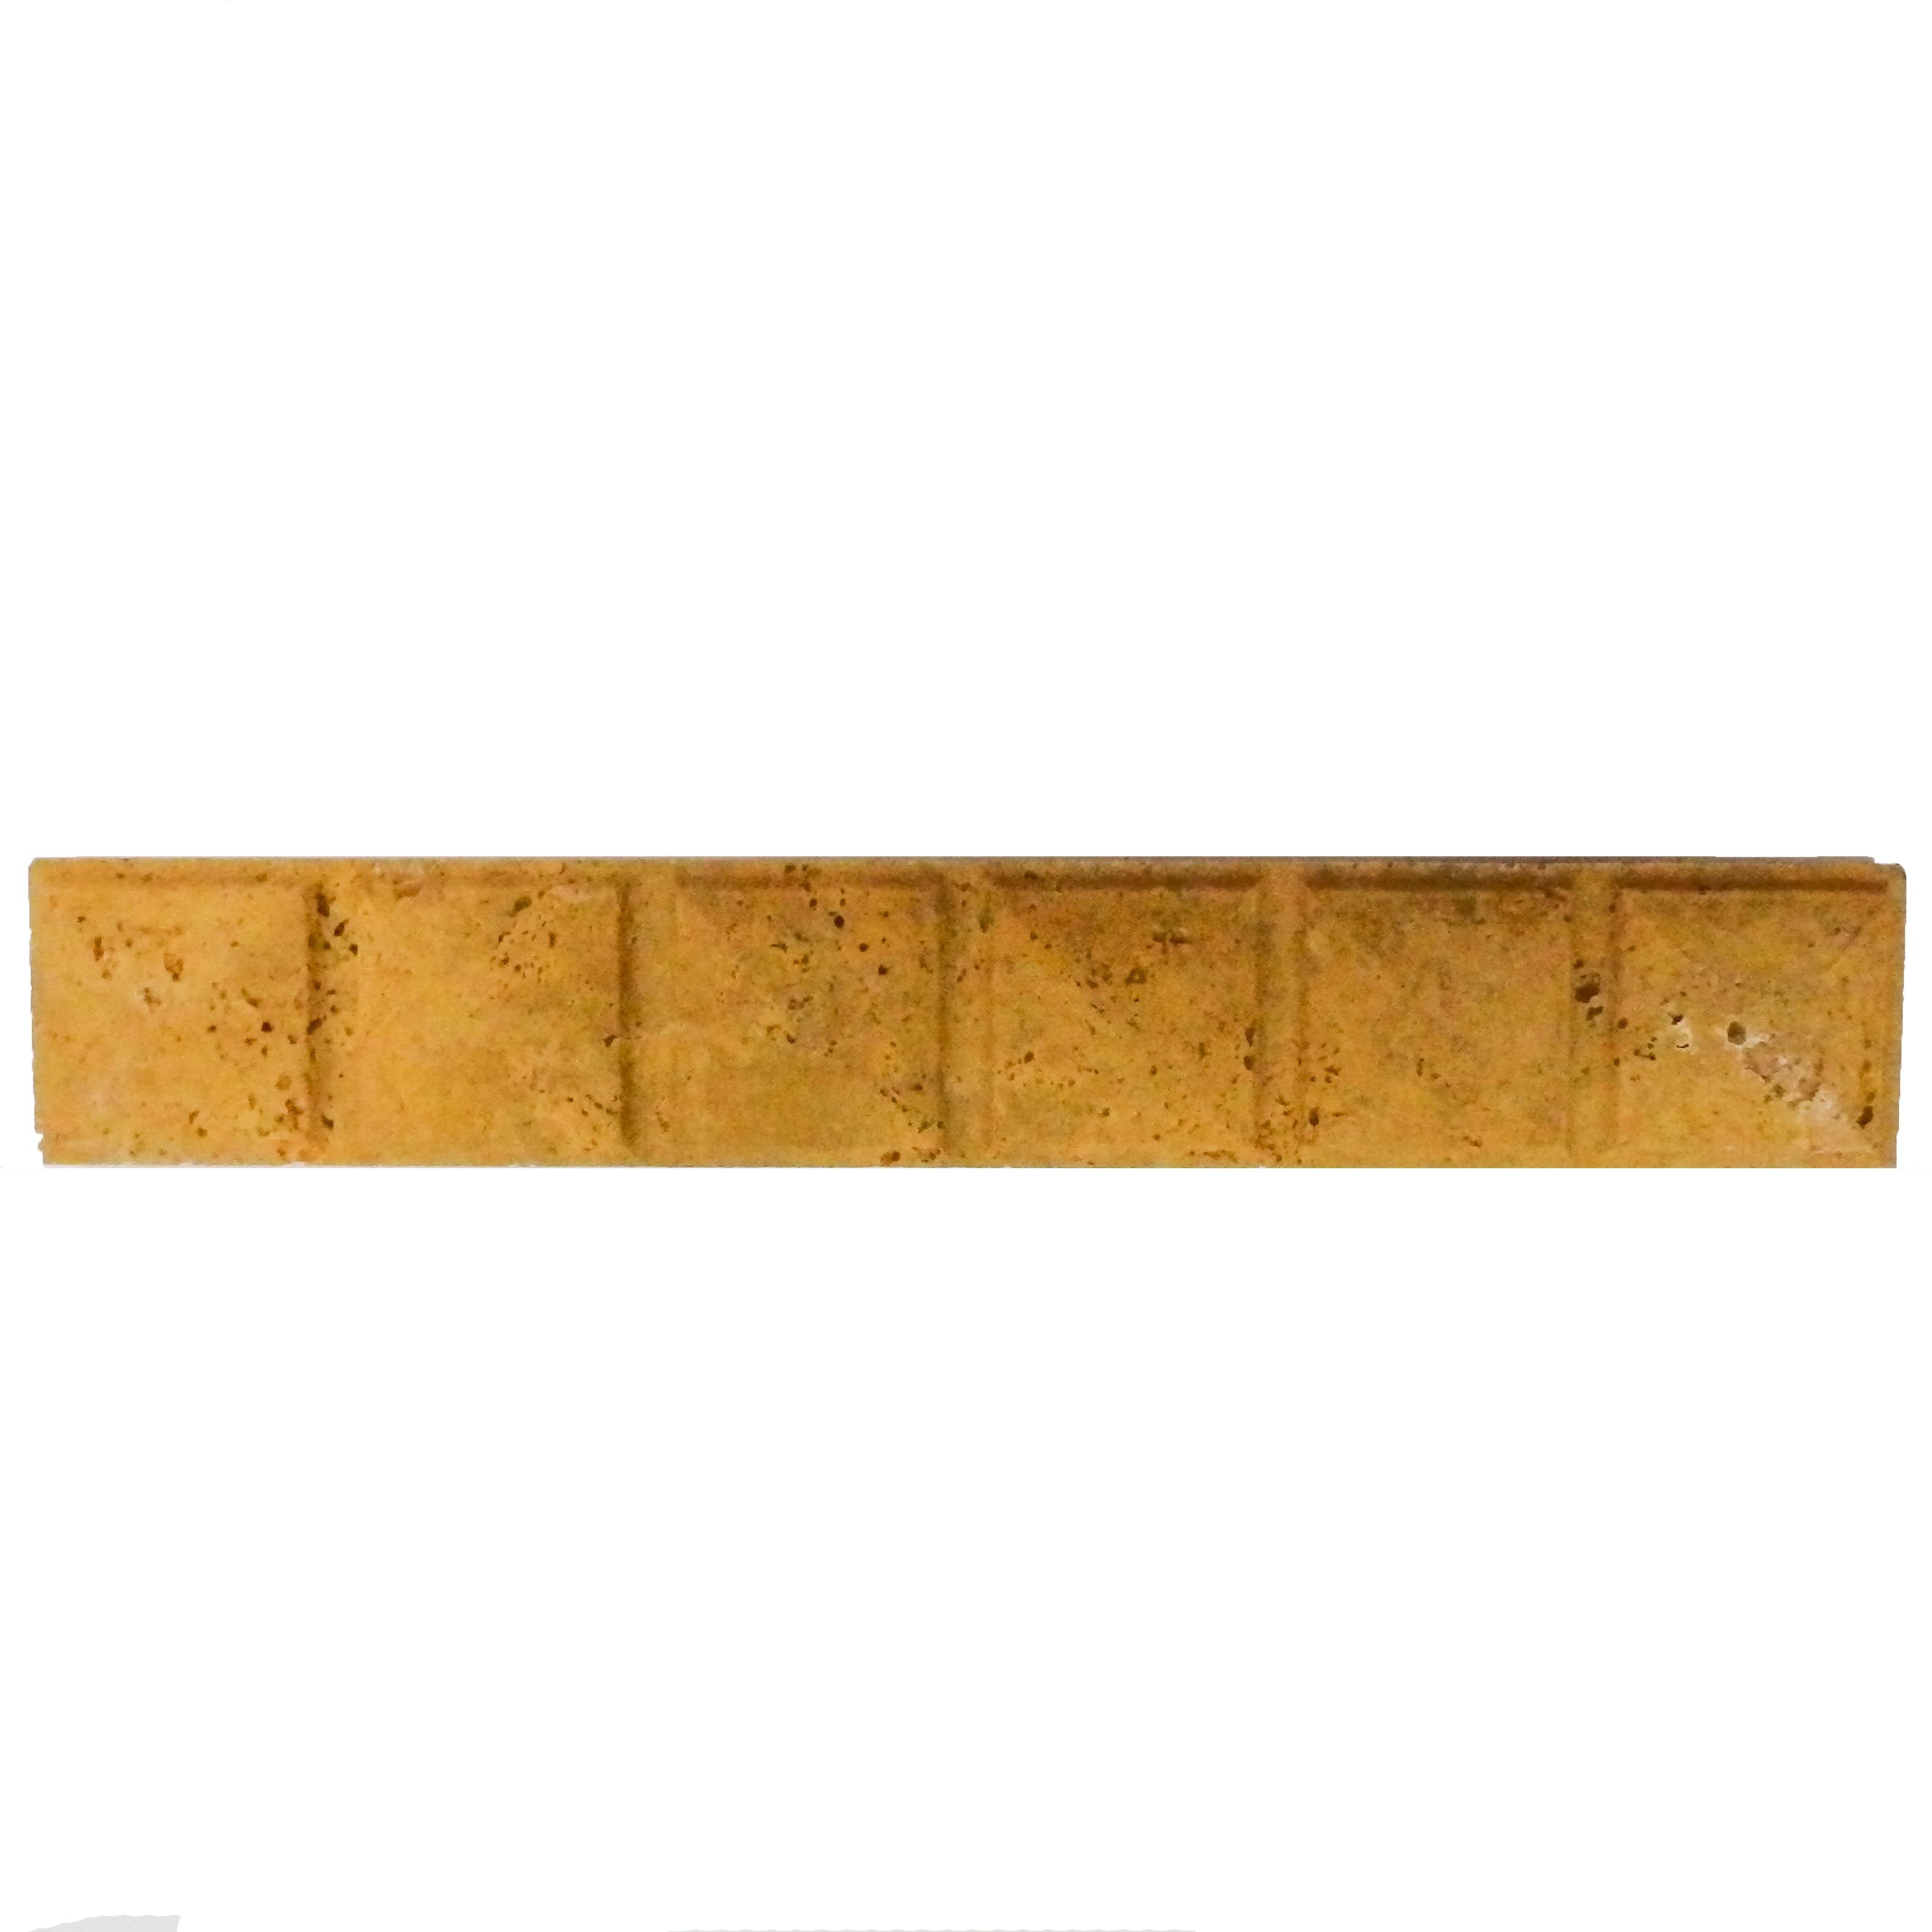 Item #6192 - Gold Pyramid Travertine Molding Image